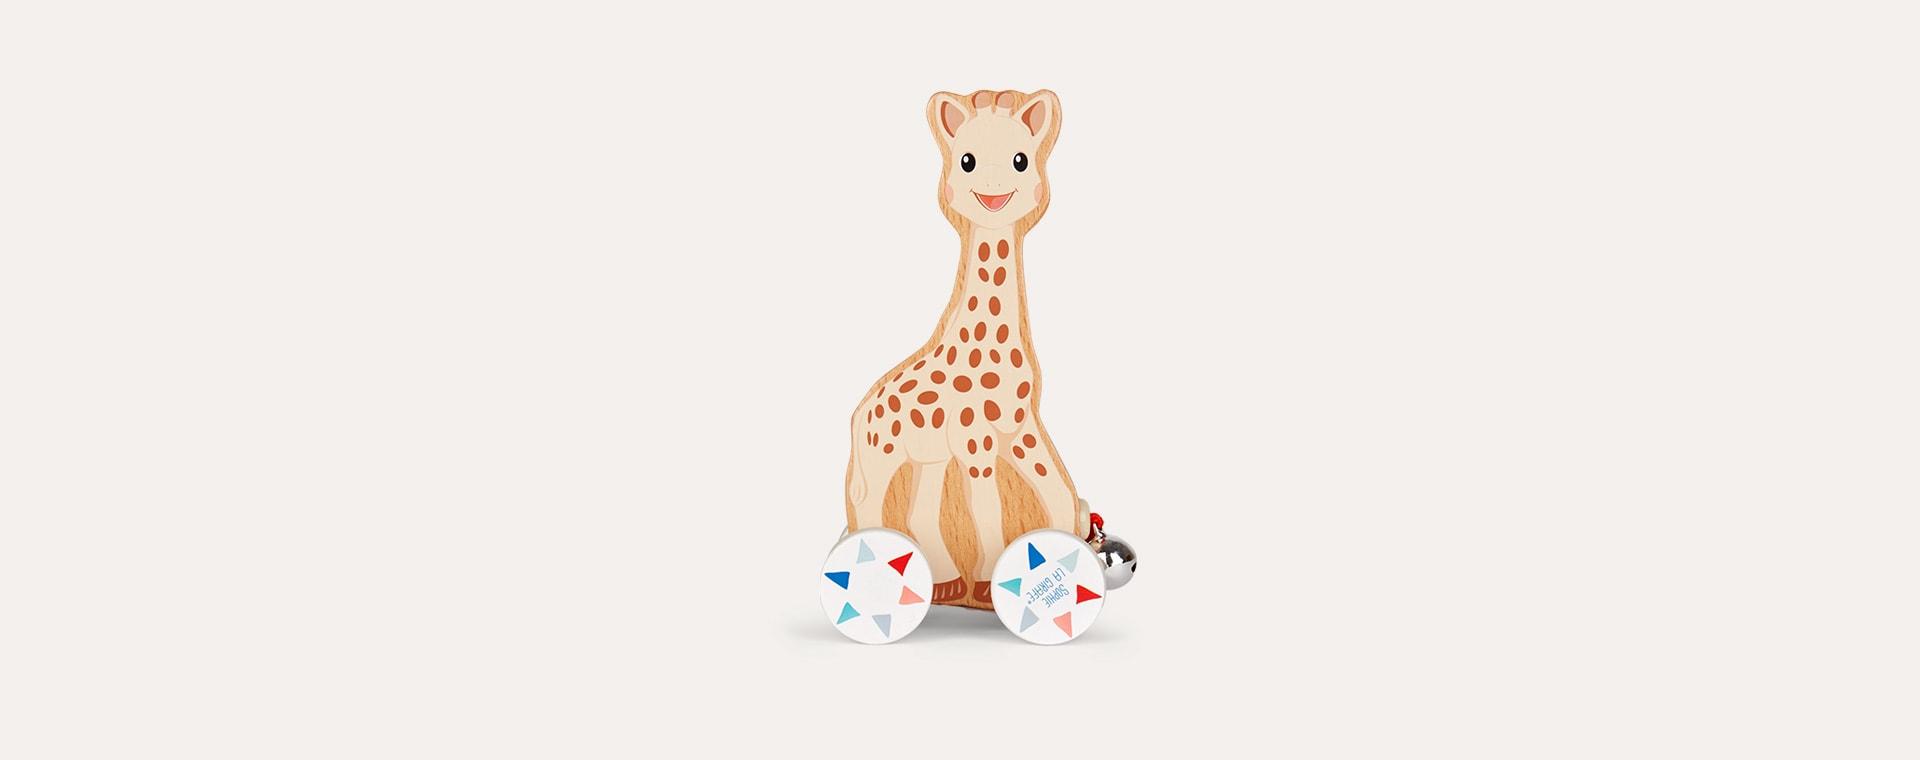 Neutral Janod Sophie la girafe Pull-Along Toy